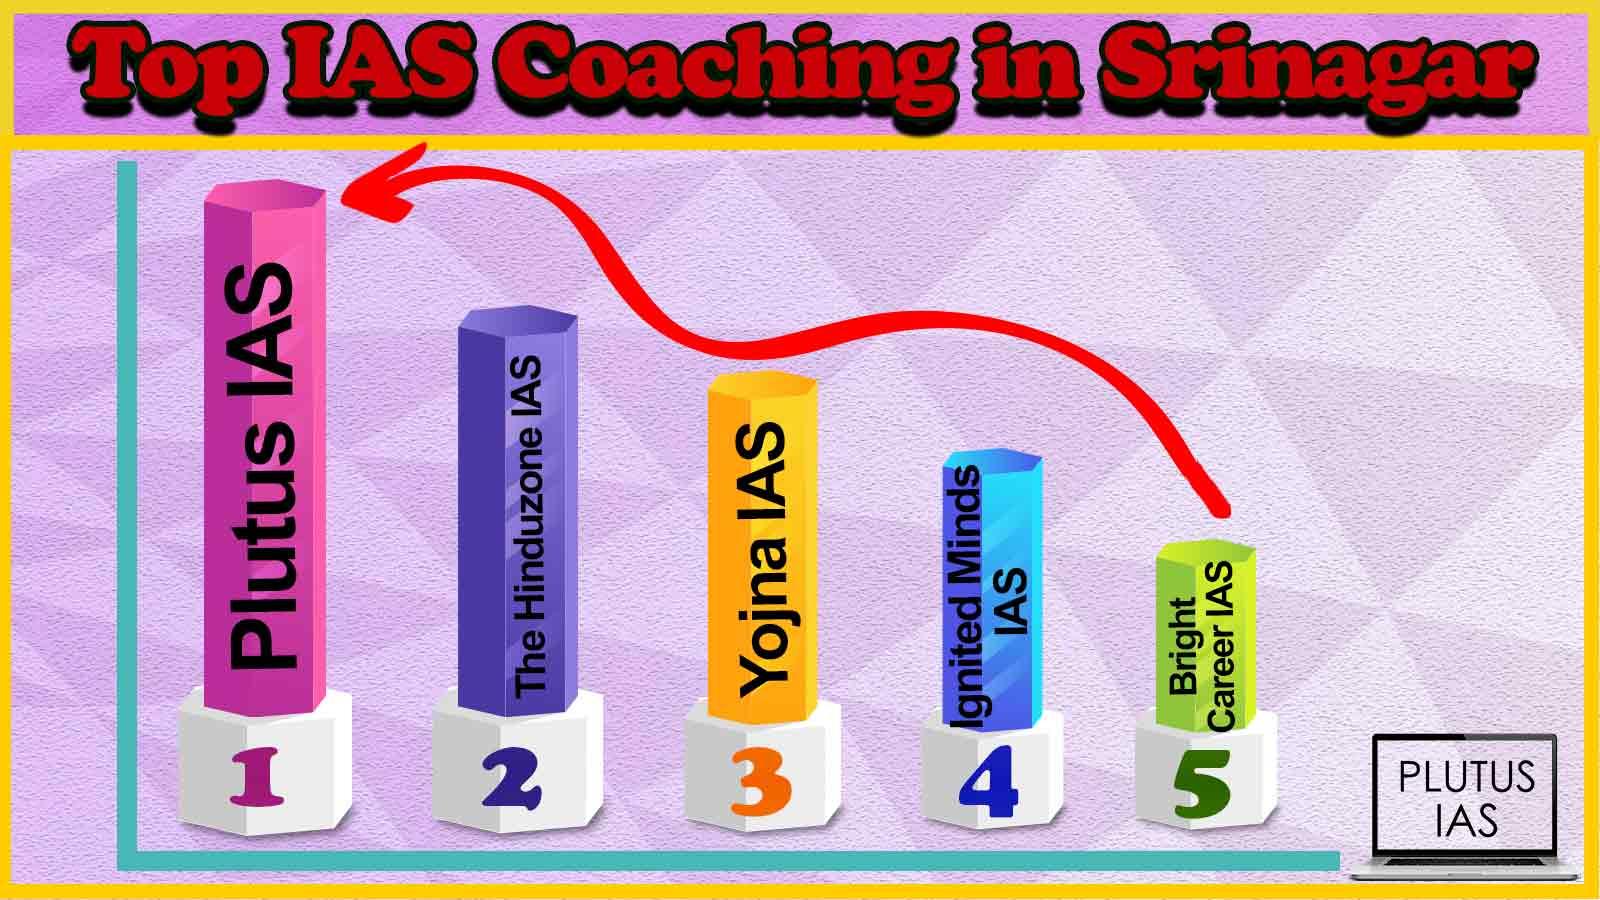 Best 10 IAS Coaching in Srinagar